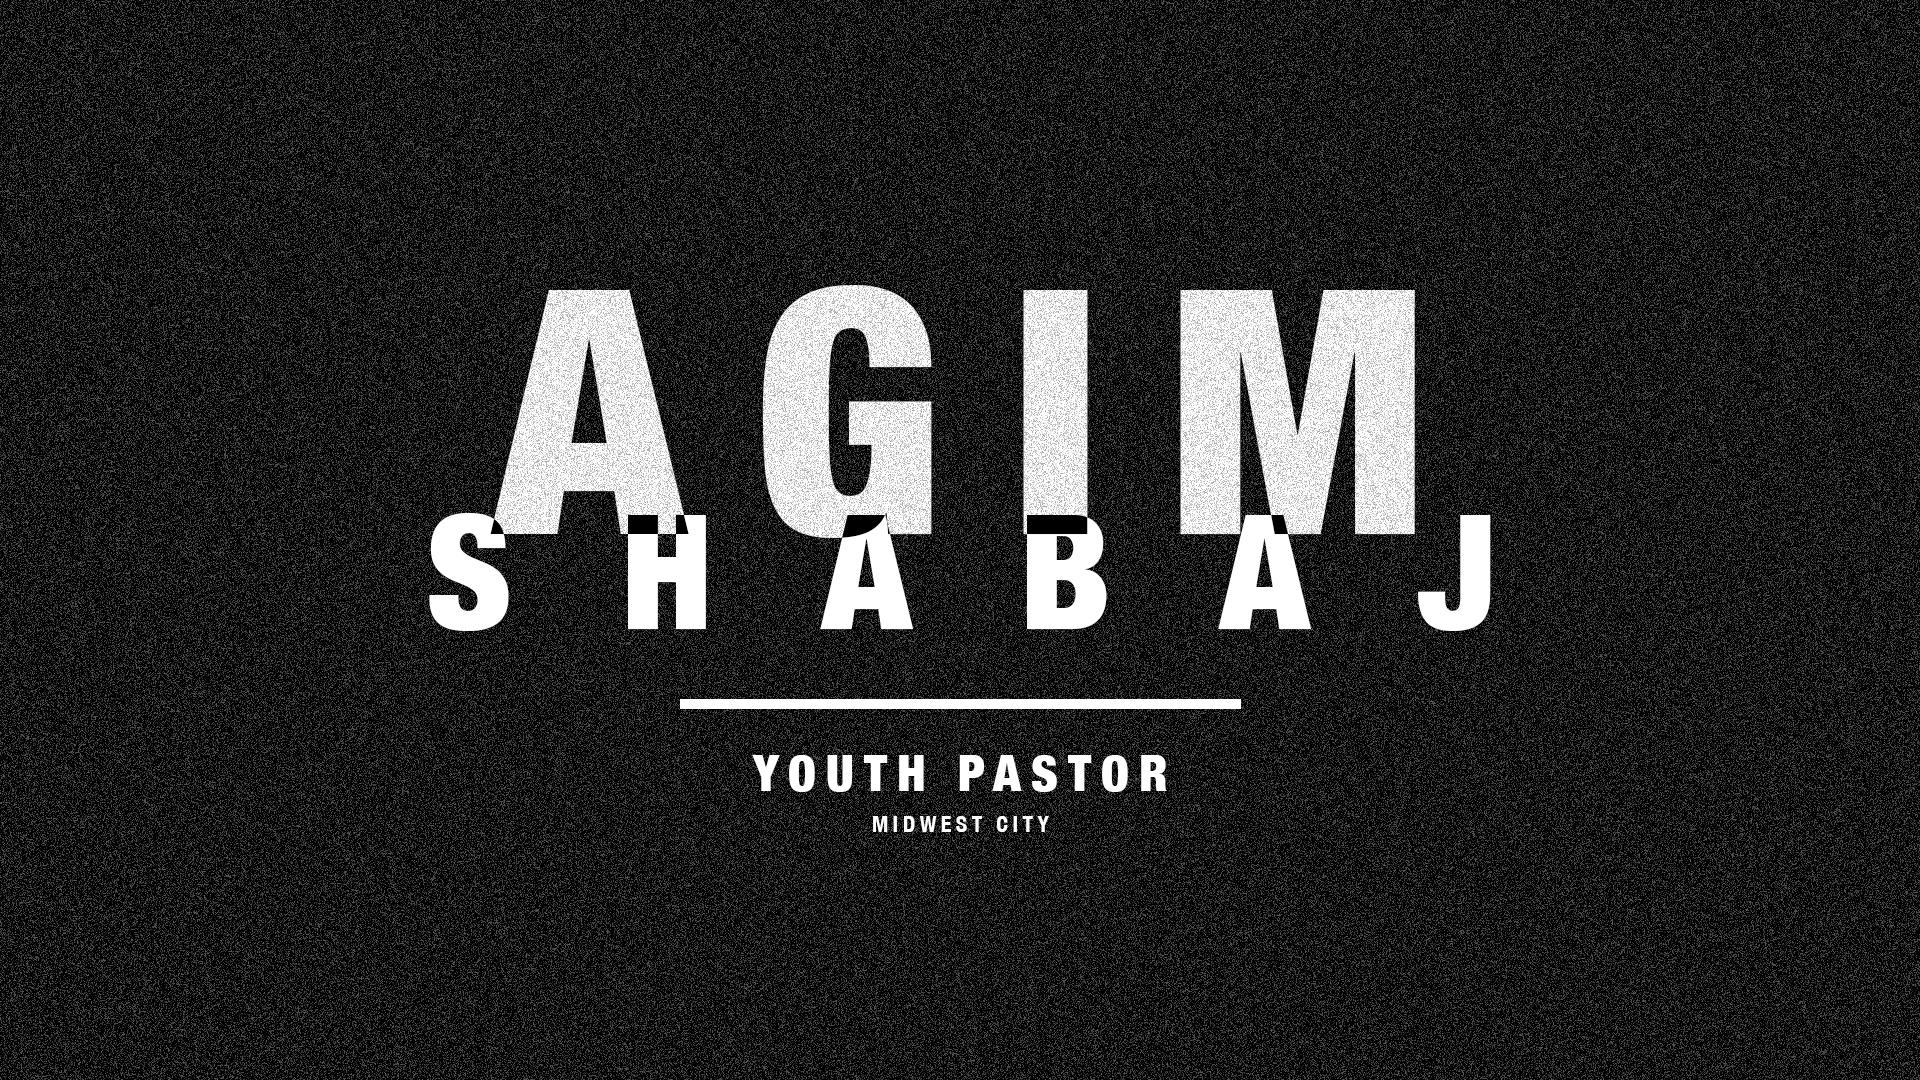 Youth Pastor Slide - black (PSD)